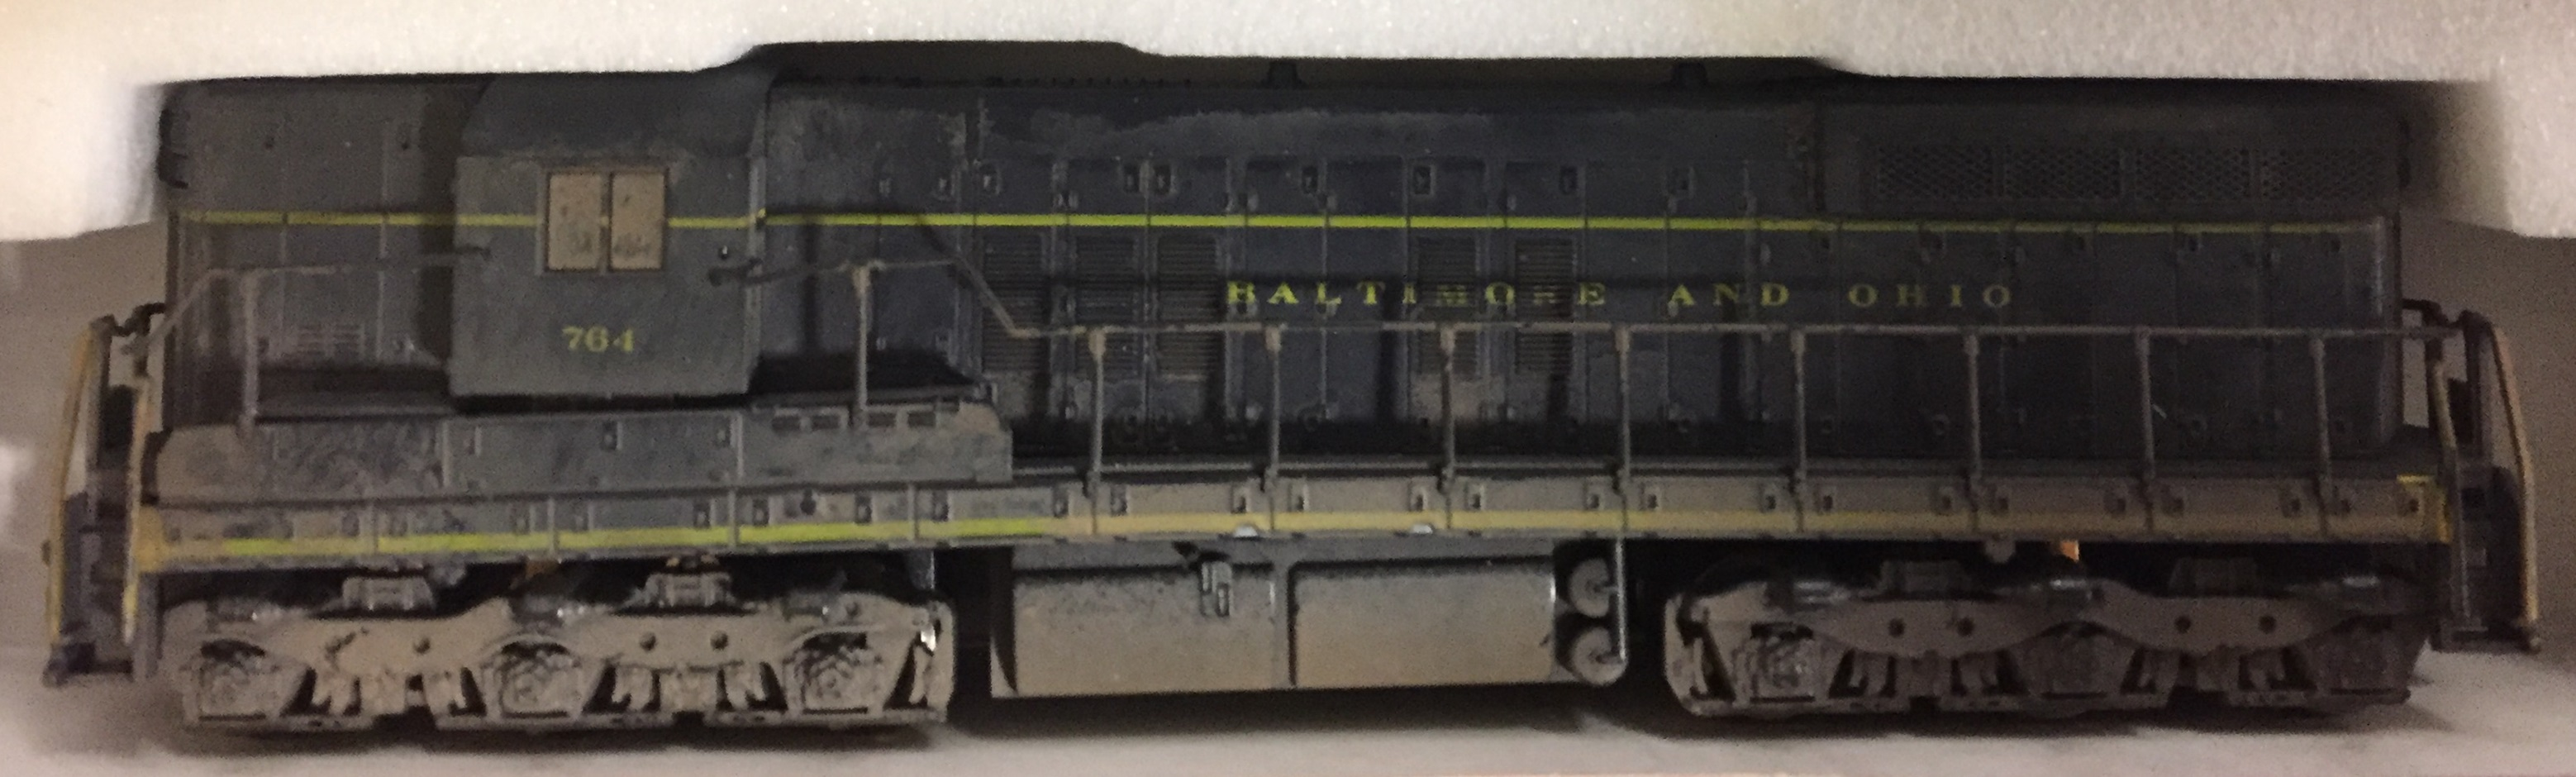 N Scale - Atlas - 4507 - Locomotive, Diesel, EMD SD7 - Baltimore & Ohio - 764